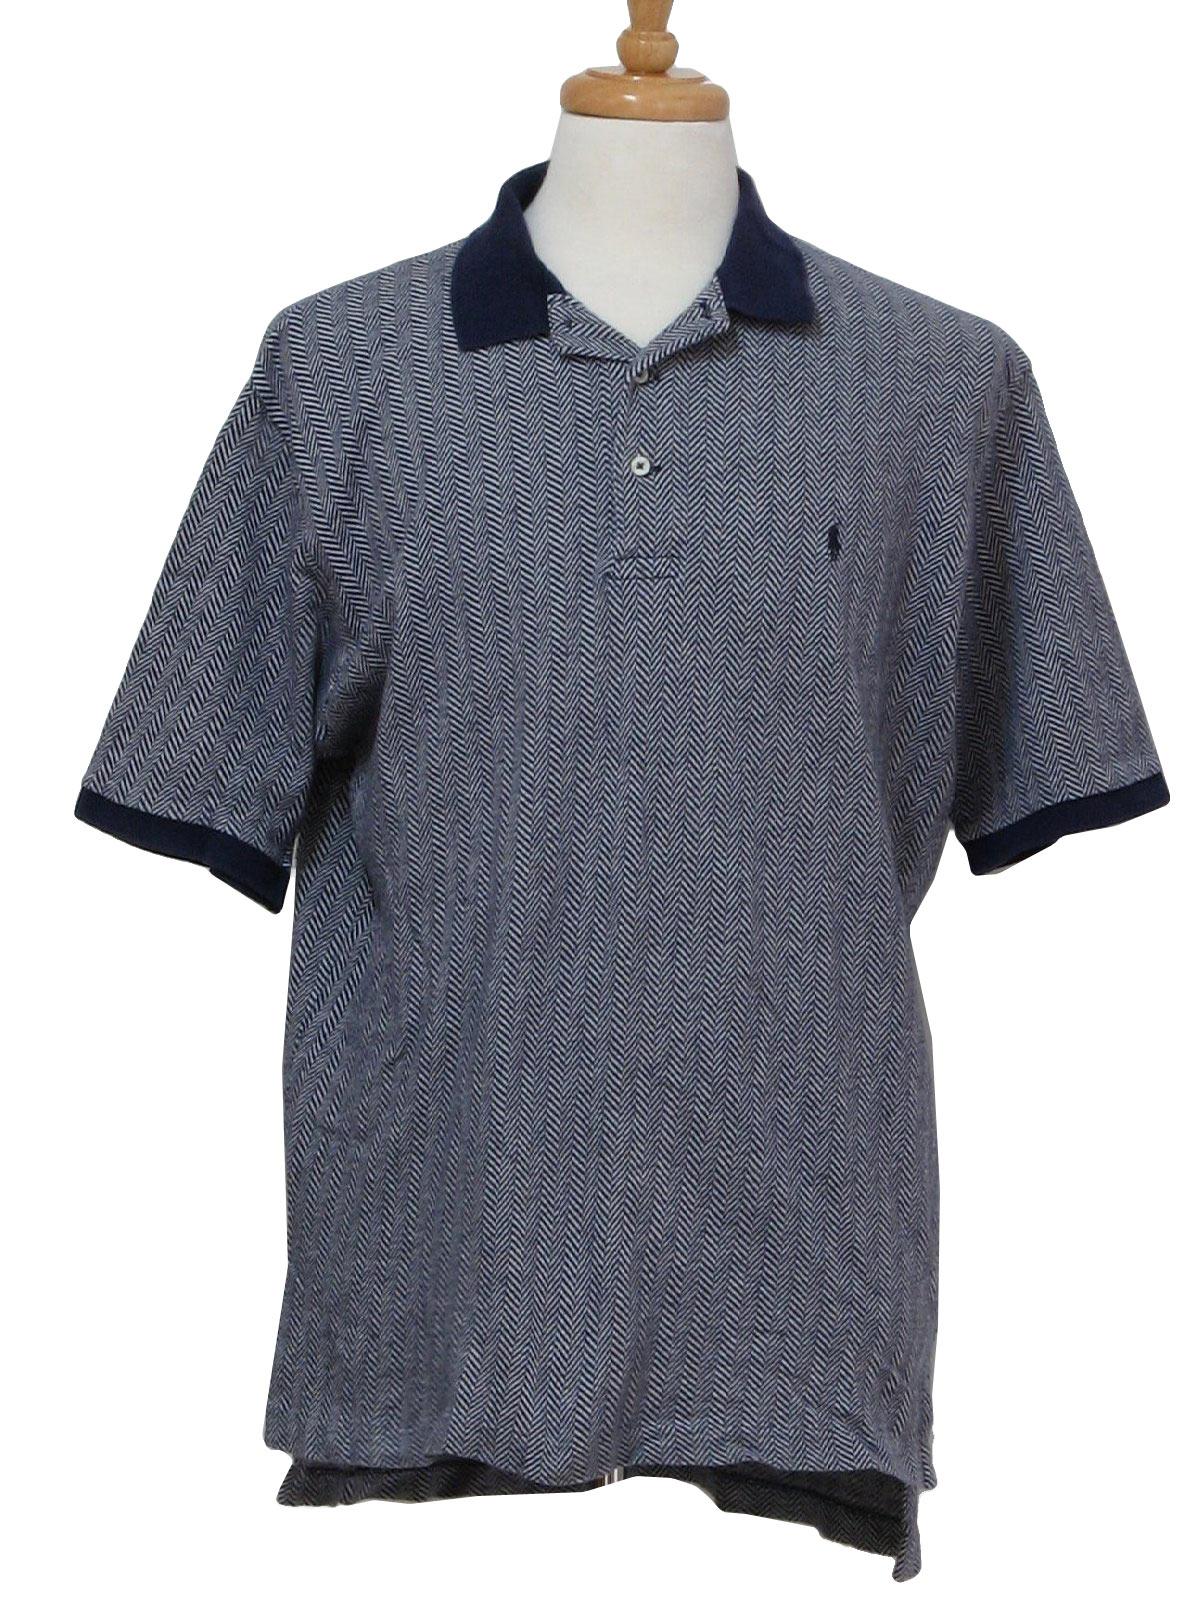 Lauren Made Totally Polo Ralph In Hong 1990's 80s Shirt Kong Mens e2EH9WDbIY